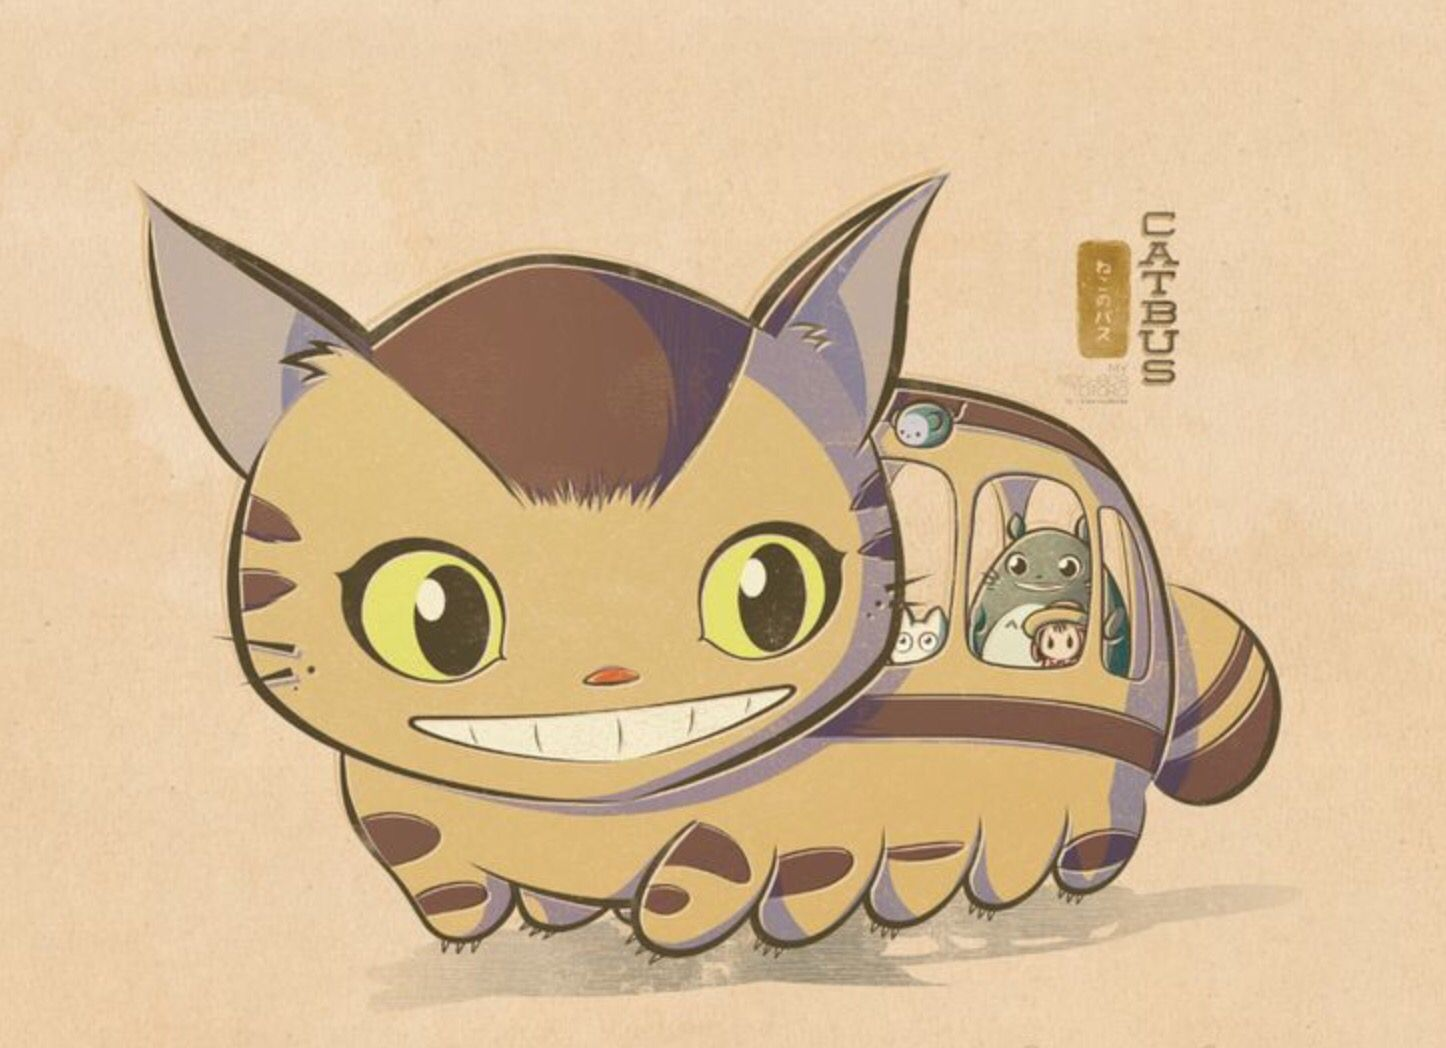 1446x1048 Chibi Chat Bus So Cute Totoro Totoro Totoro